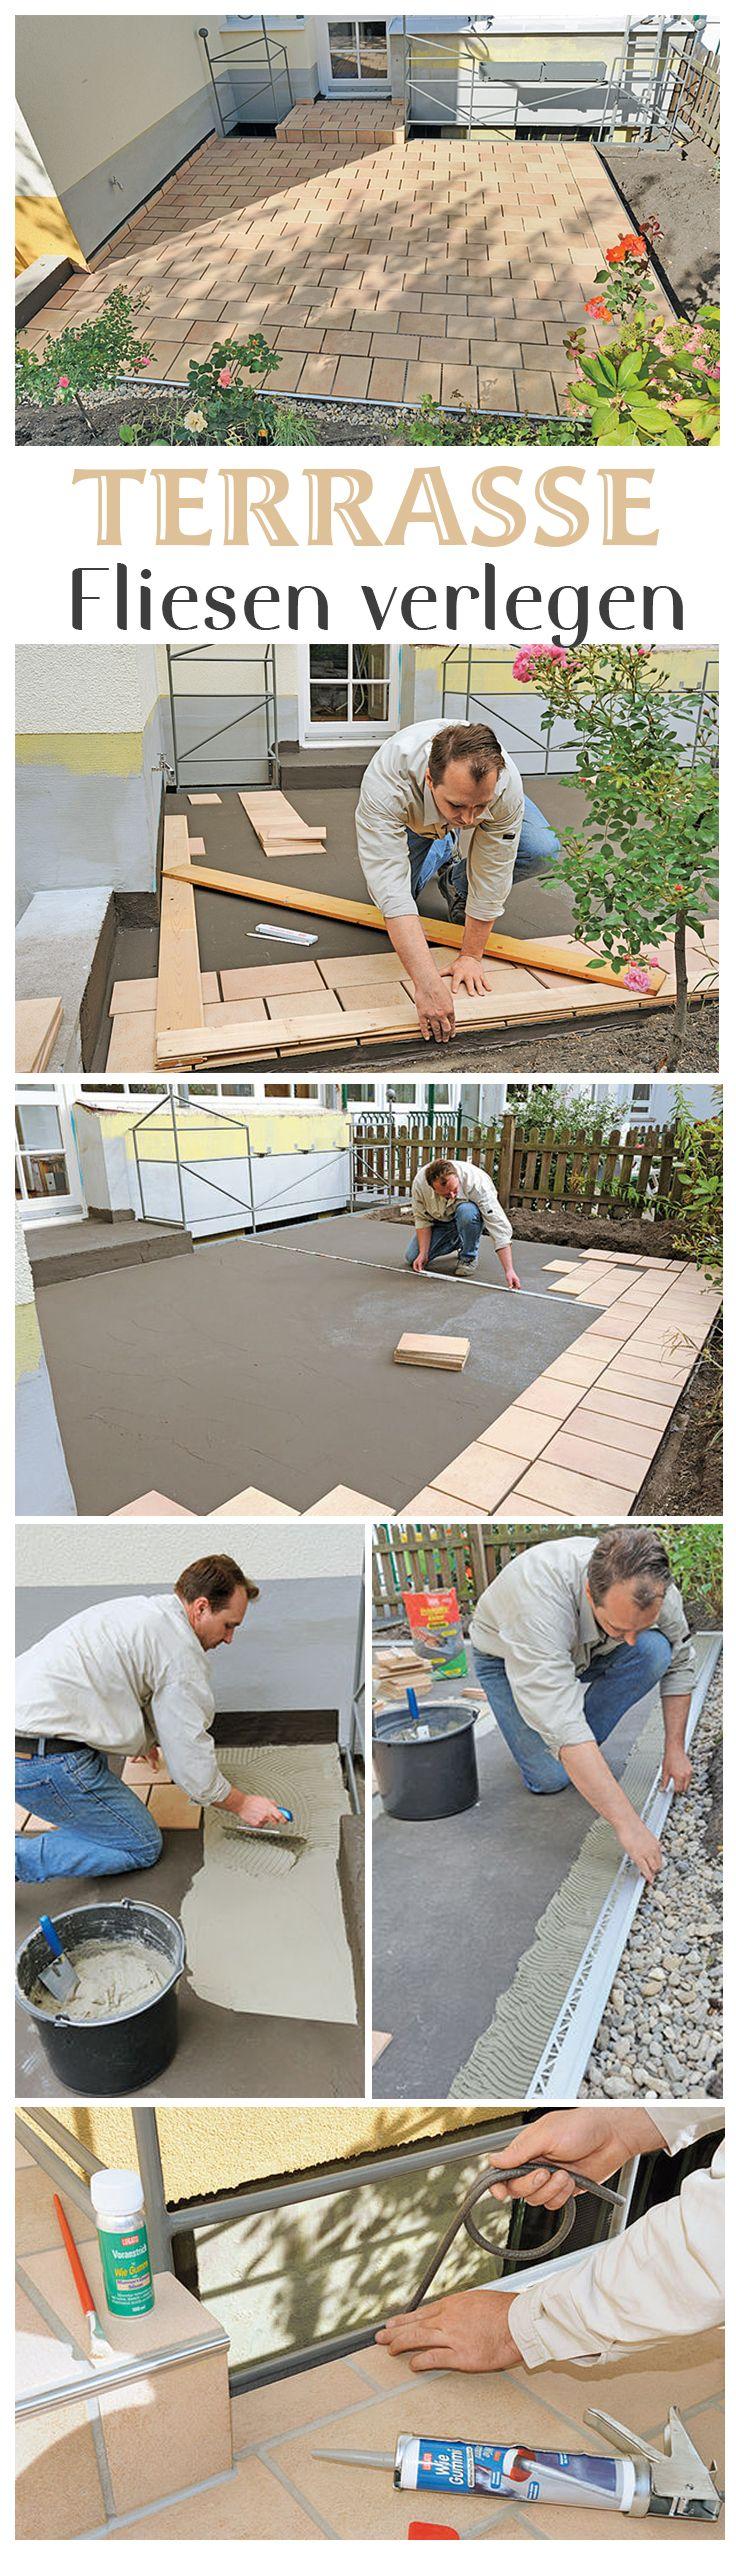 25 b sta terrassenfliesen holz id erna p pinterest. Black Bedroom Furniture Sets. Home Design Ideas